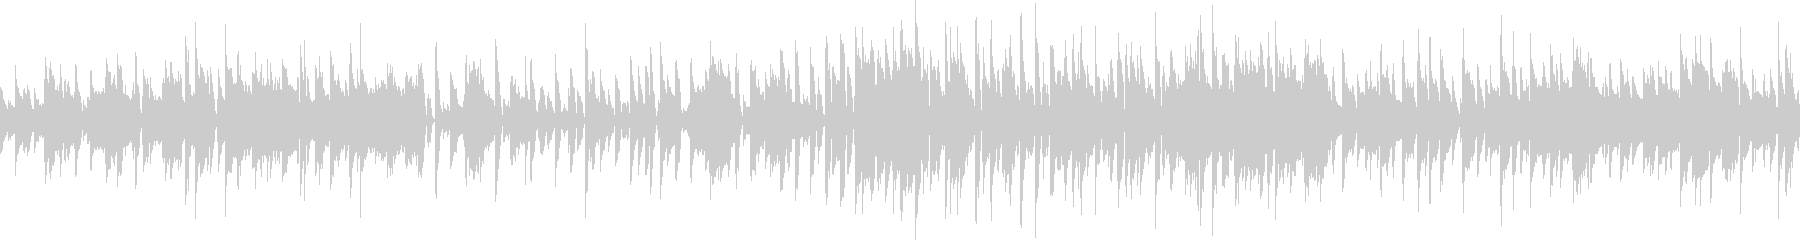 Casino music (loop specification)'s unreproduced waveform